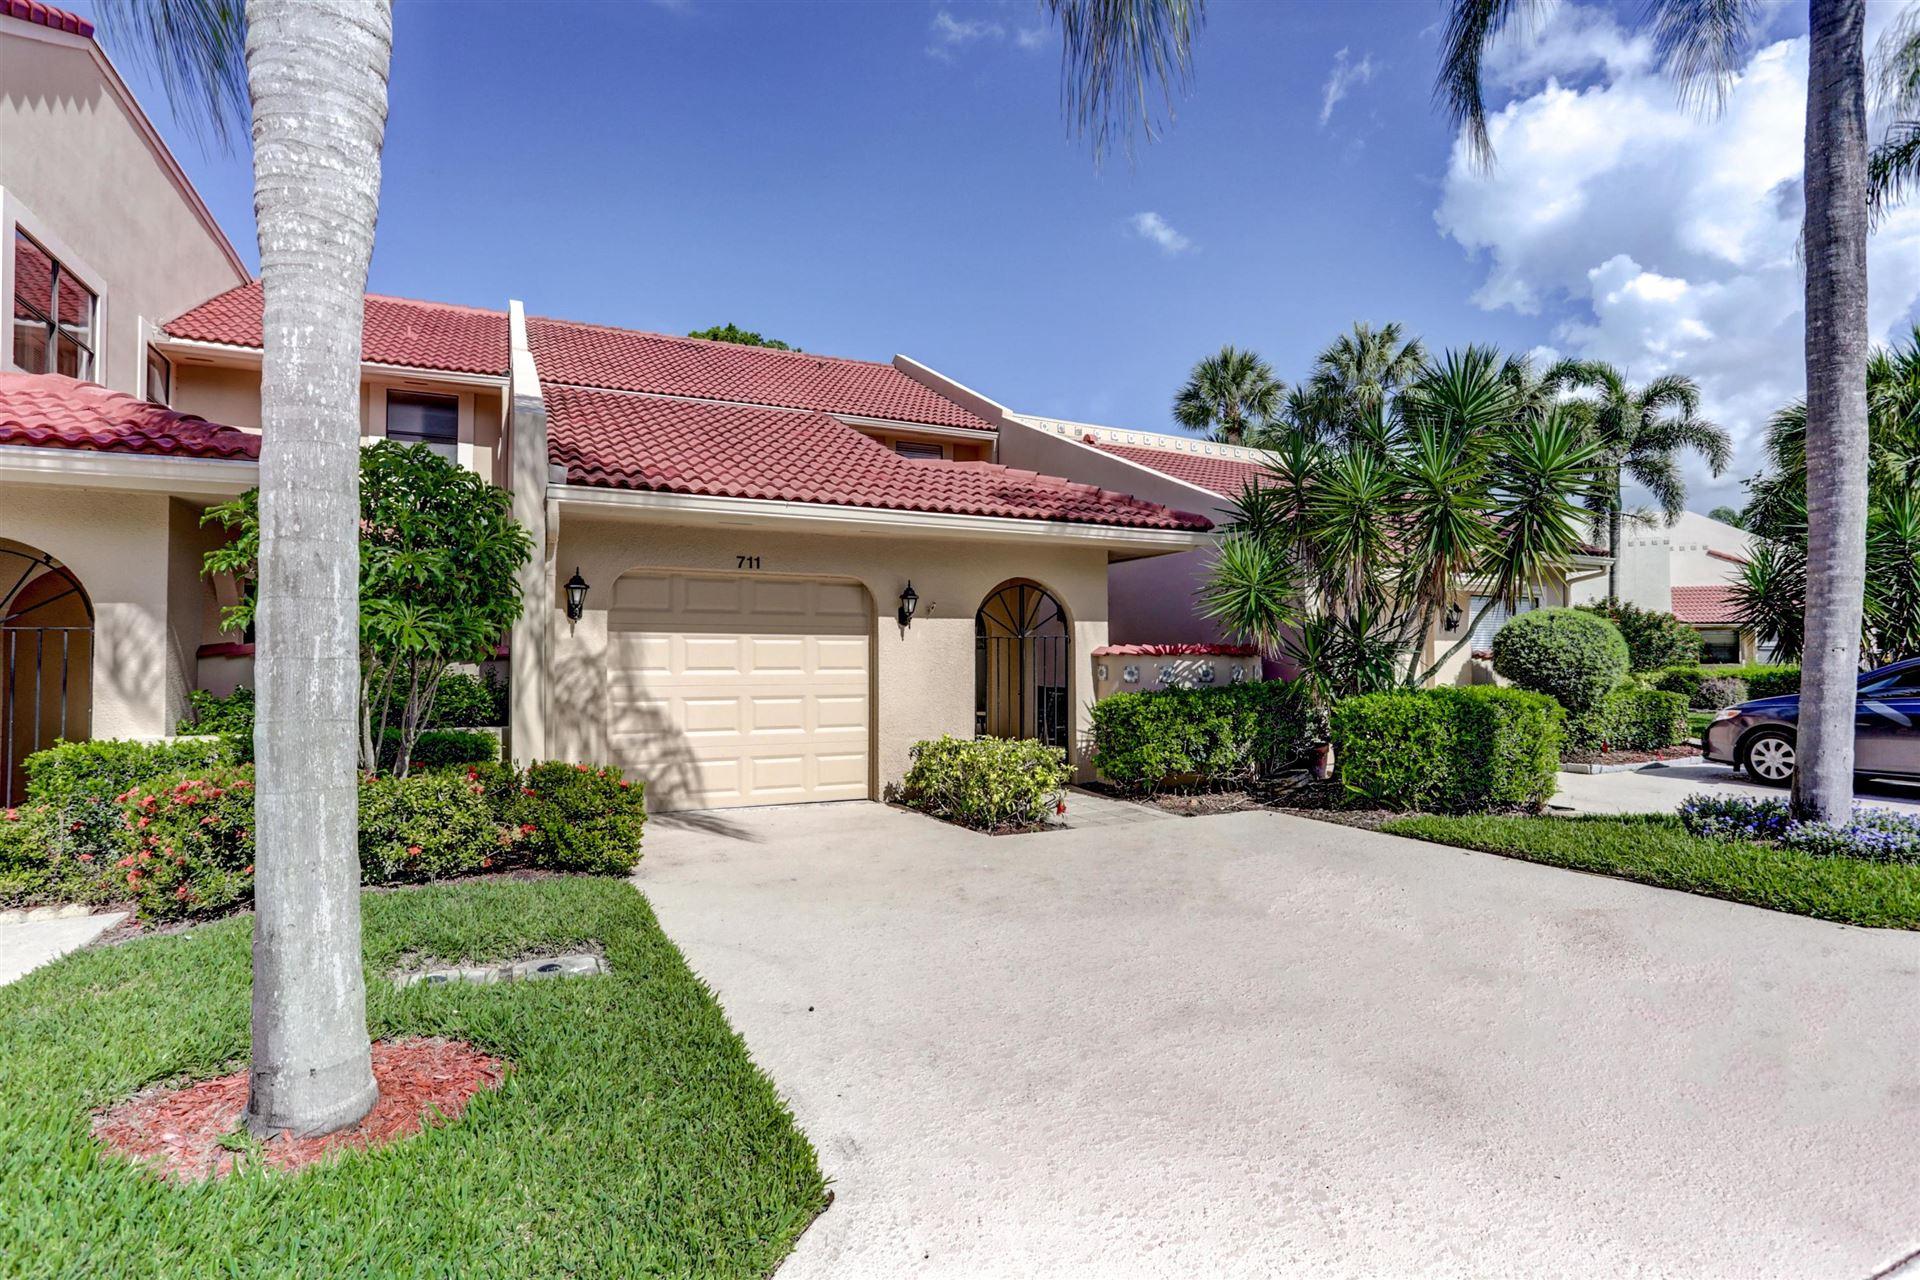 Photo of 711 Windermere Way, Palm Beach Gardens, FL 33418 (MLS # RX-10715126)